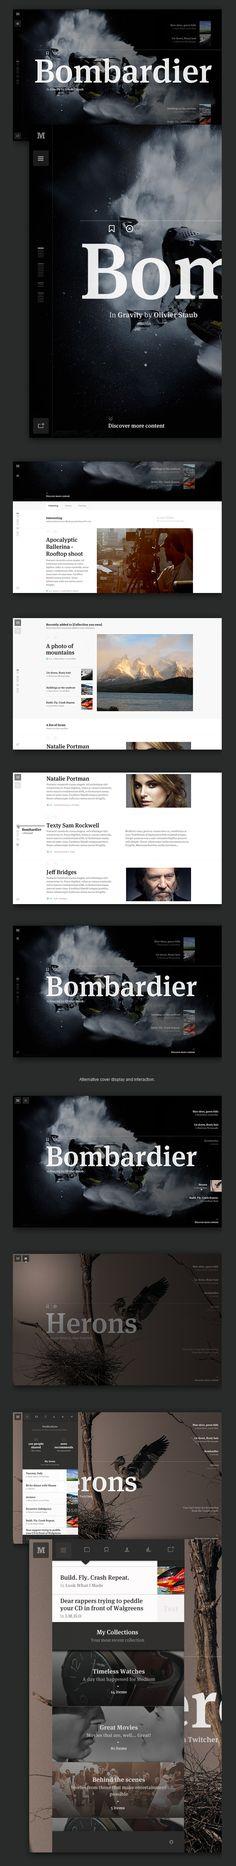 Medium Collection Concept by Leigh Taylor Web Design Mobile, Web Ui Design, Best Web Design, Site Design, Web Layout, Layout Design, Responsive Layout, Apps, Ui Web